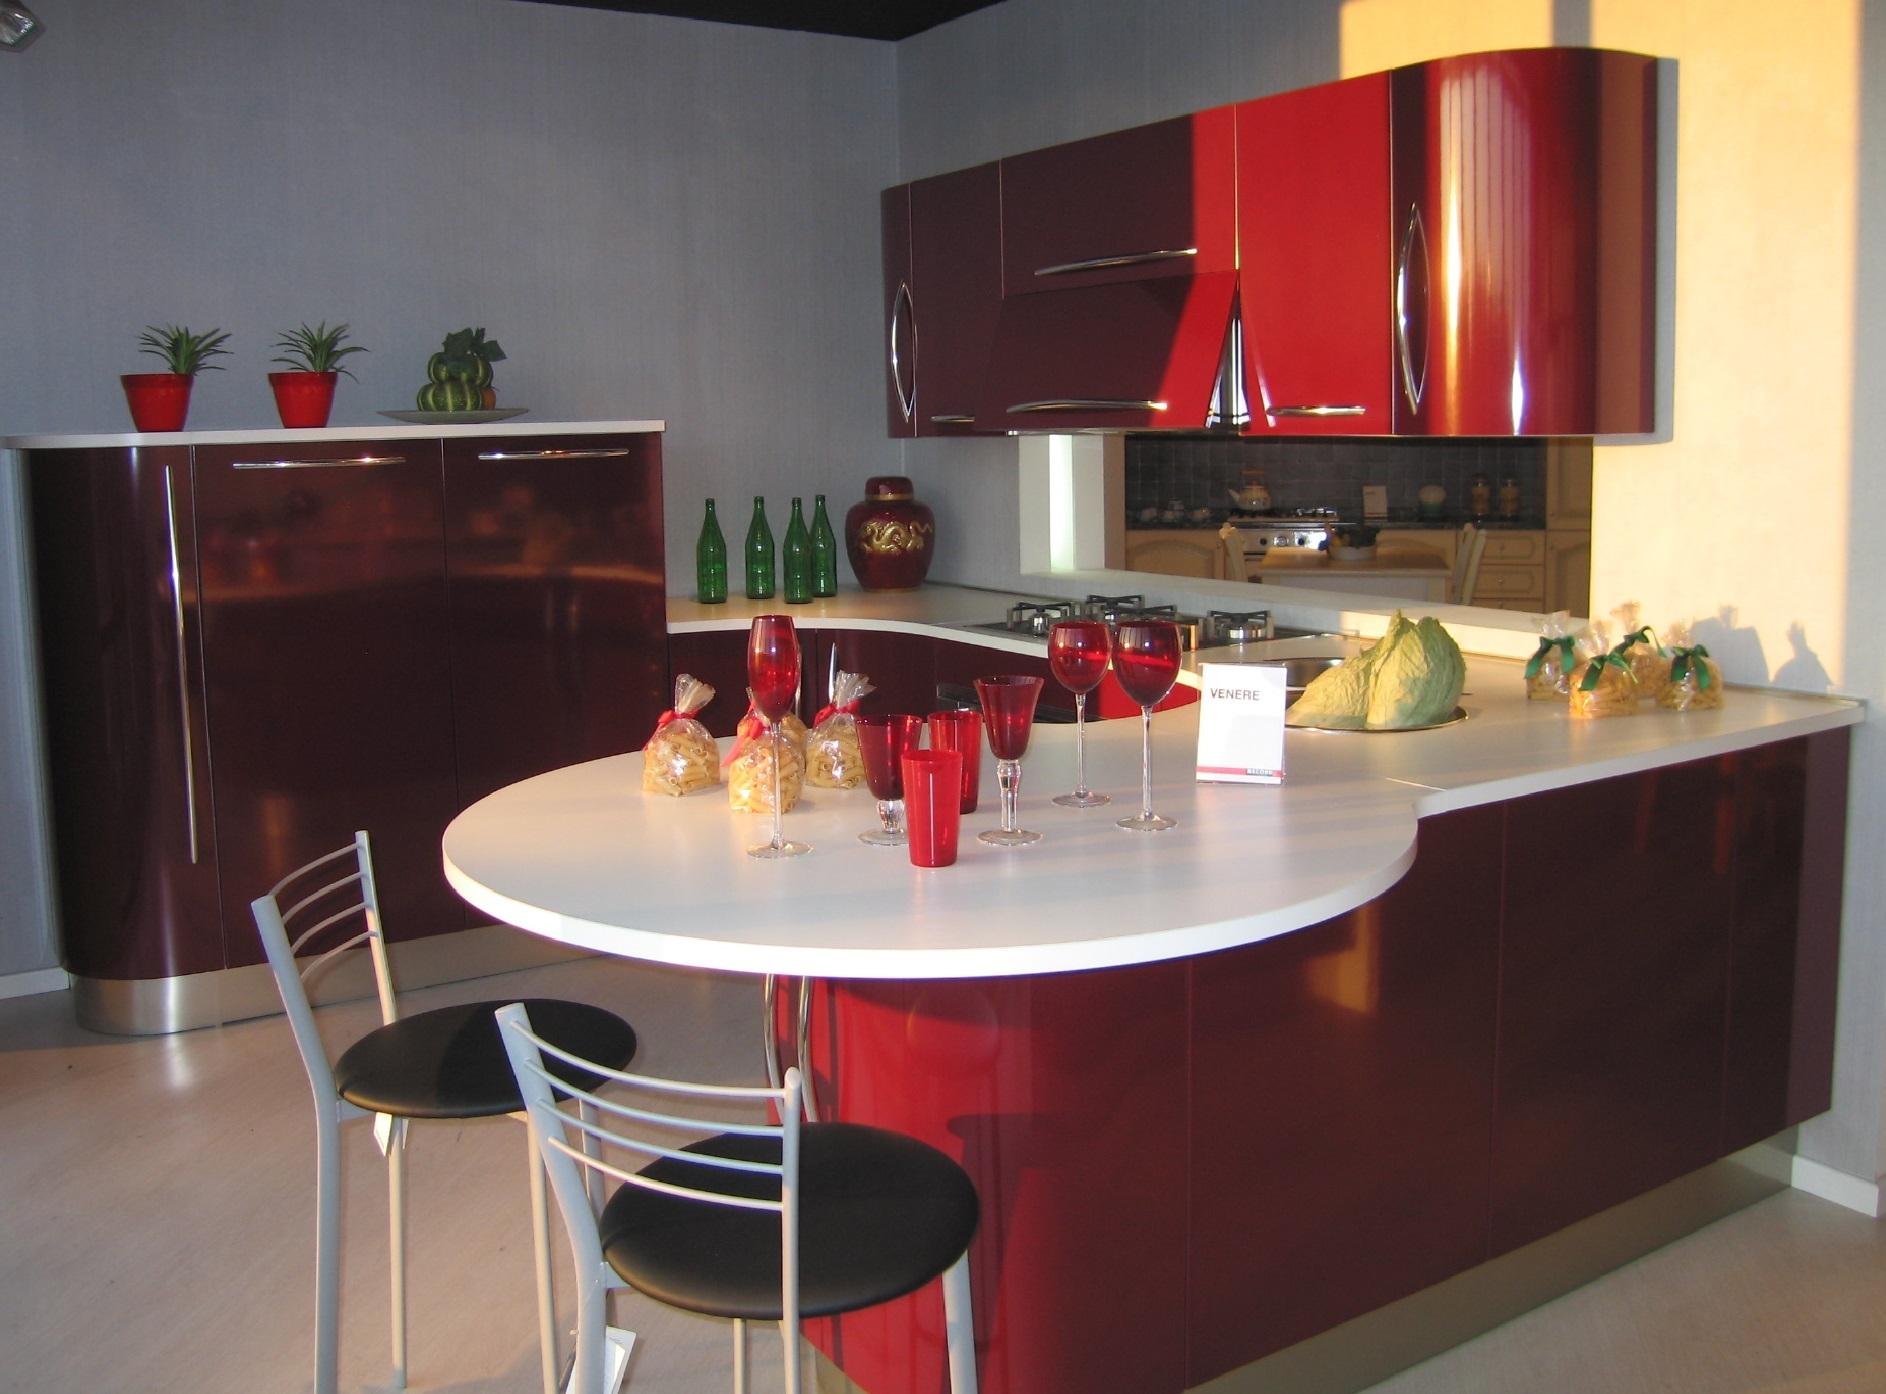 Cucina record cucine venere design cucine a prezzi scontati for Cucine record